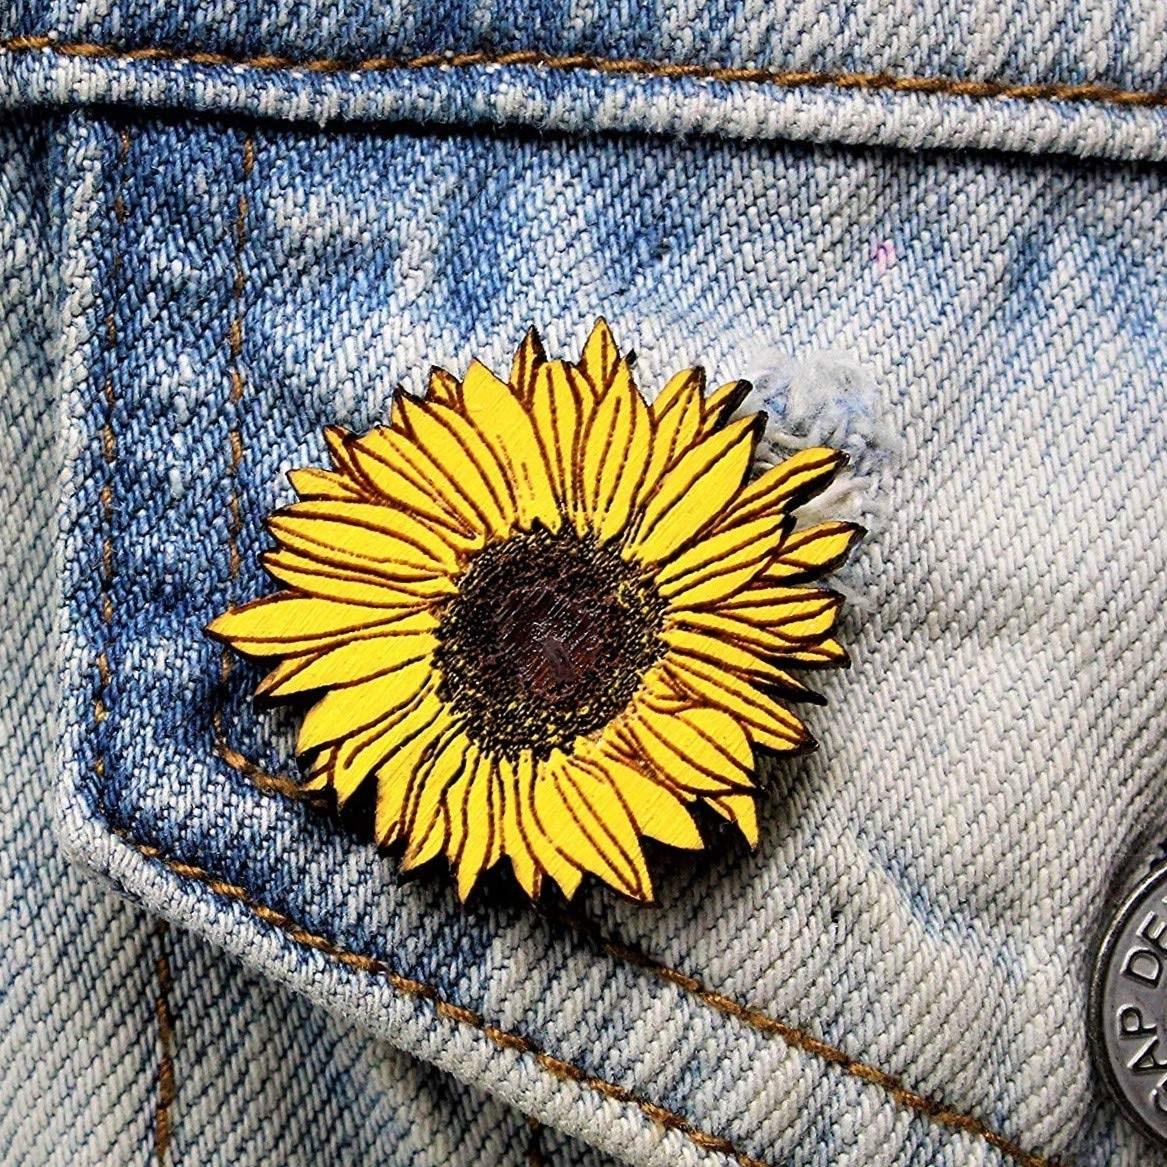 A sunflower-shaped pin on a denim jacket